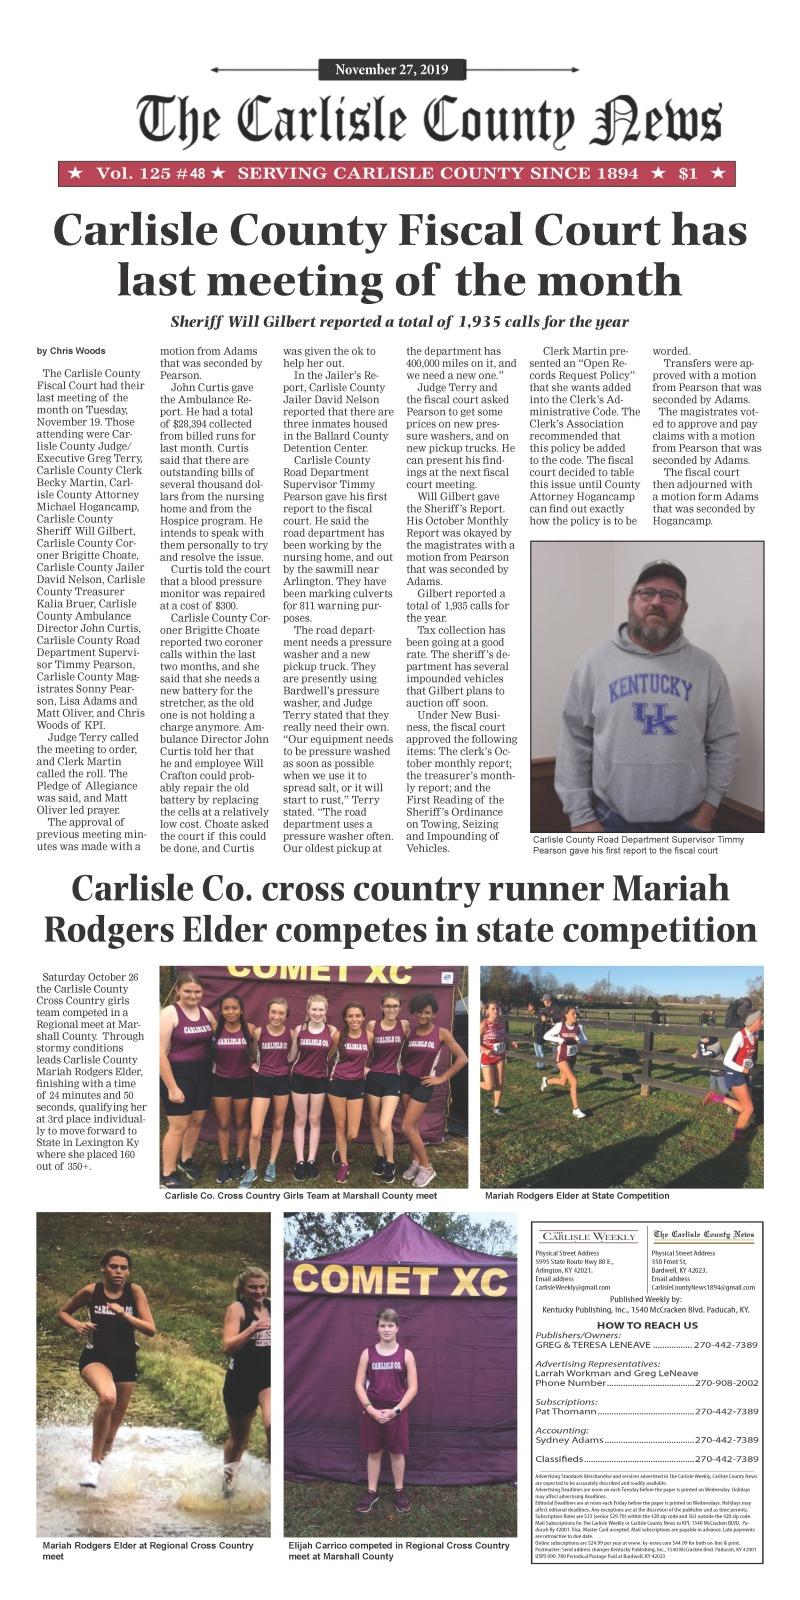 Carlisle County News 11-26-19